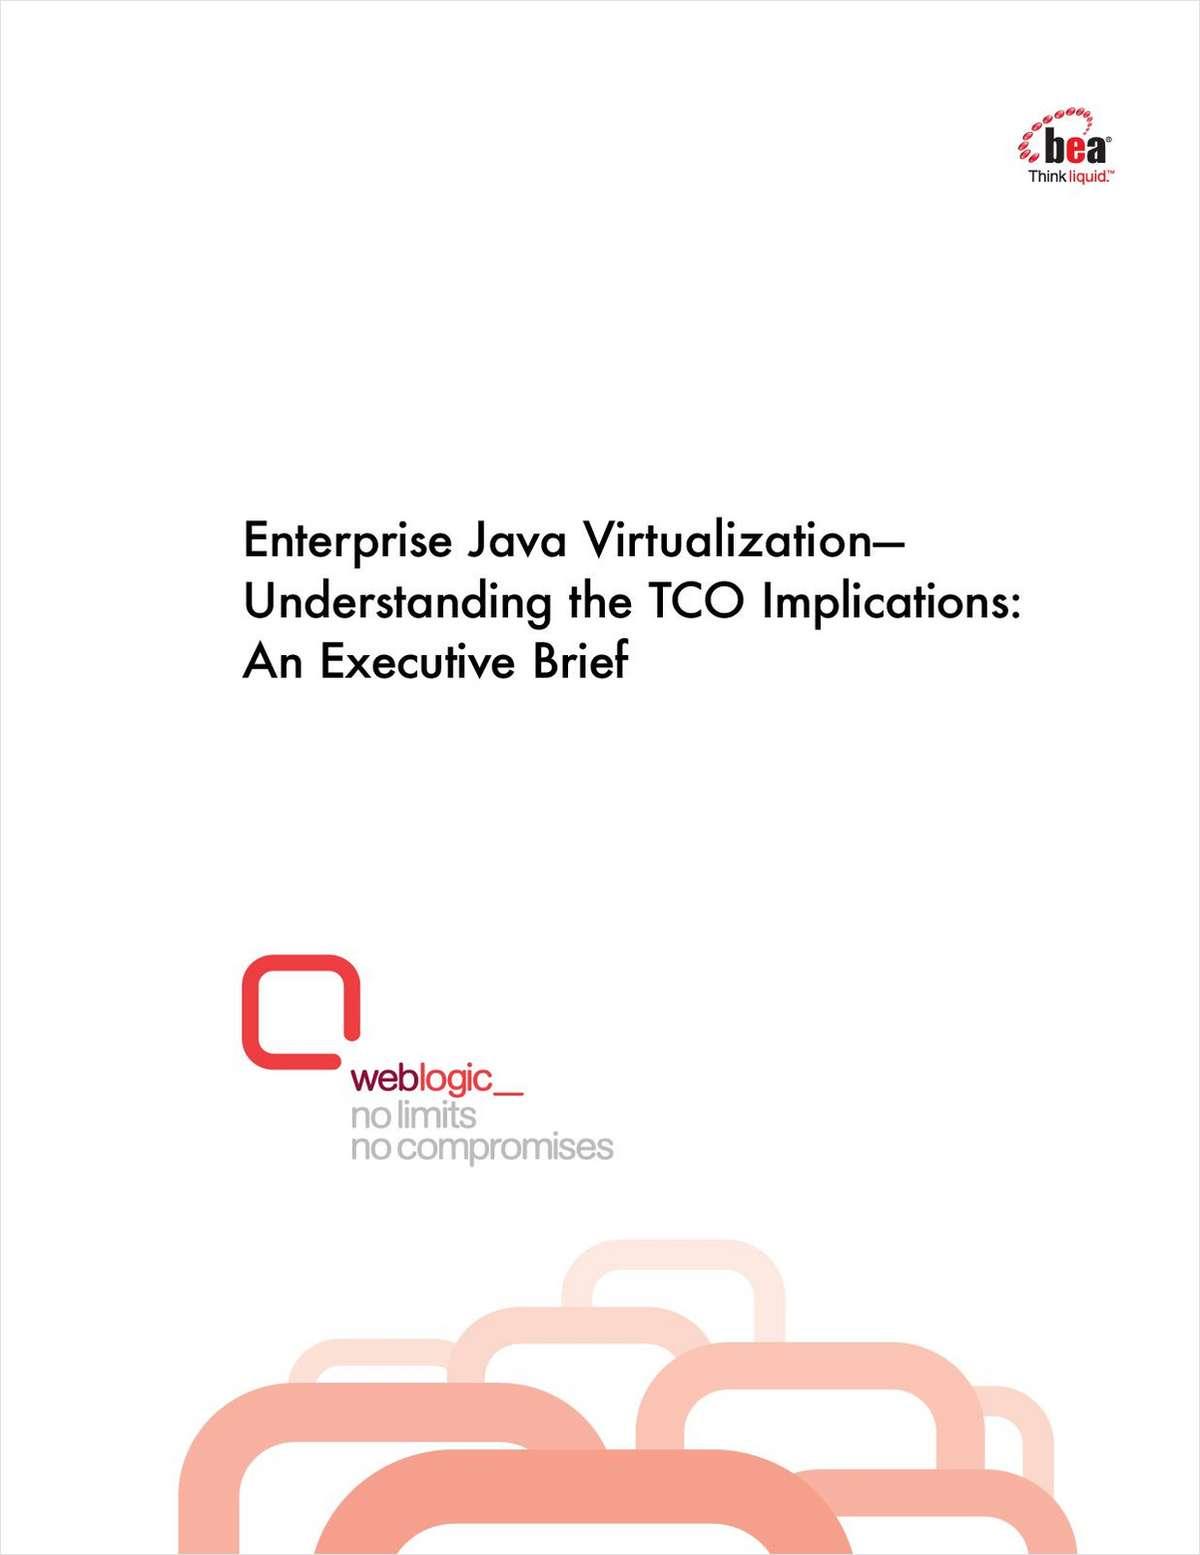 Enterprise Java Virtualization—Understanding the TCO Implications